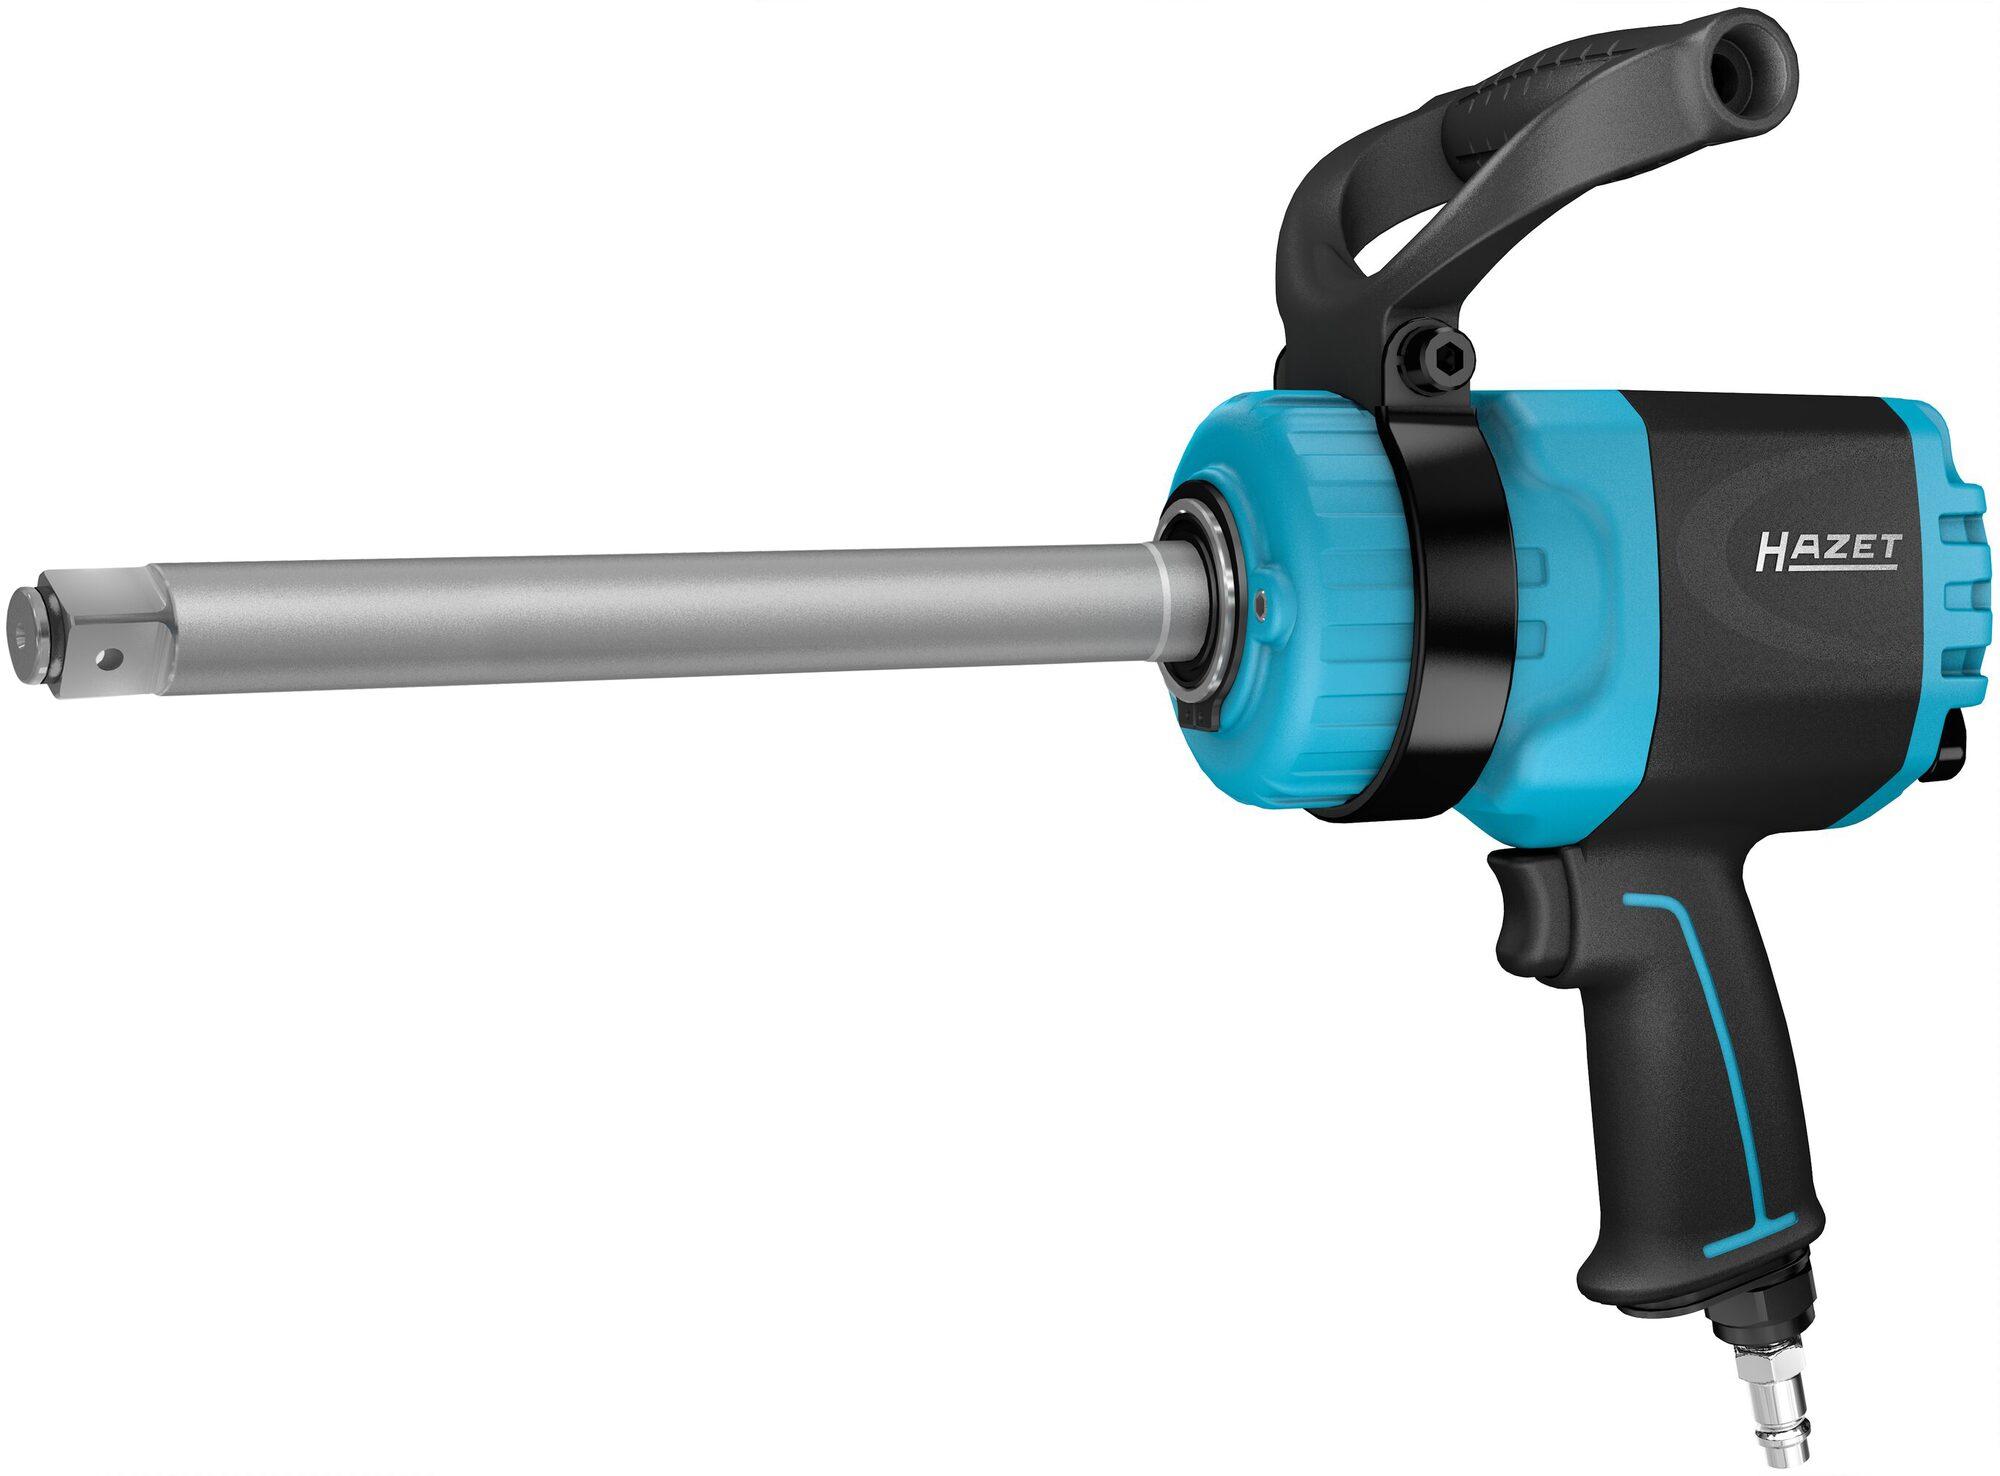 HAZET Twin Turbo Schlagschrauber ∙ lange Spindel 9014LGTT ∙ Lösemoment maximal: 3850 Nm